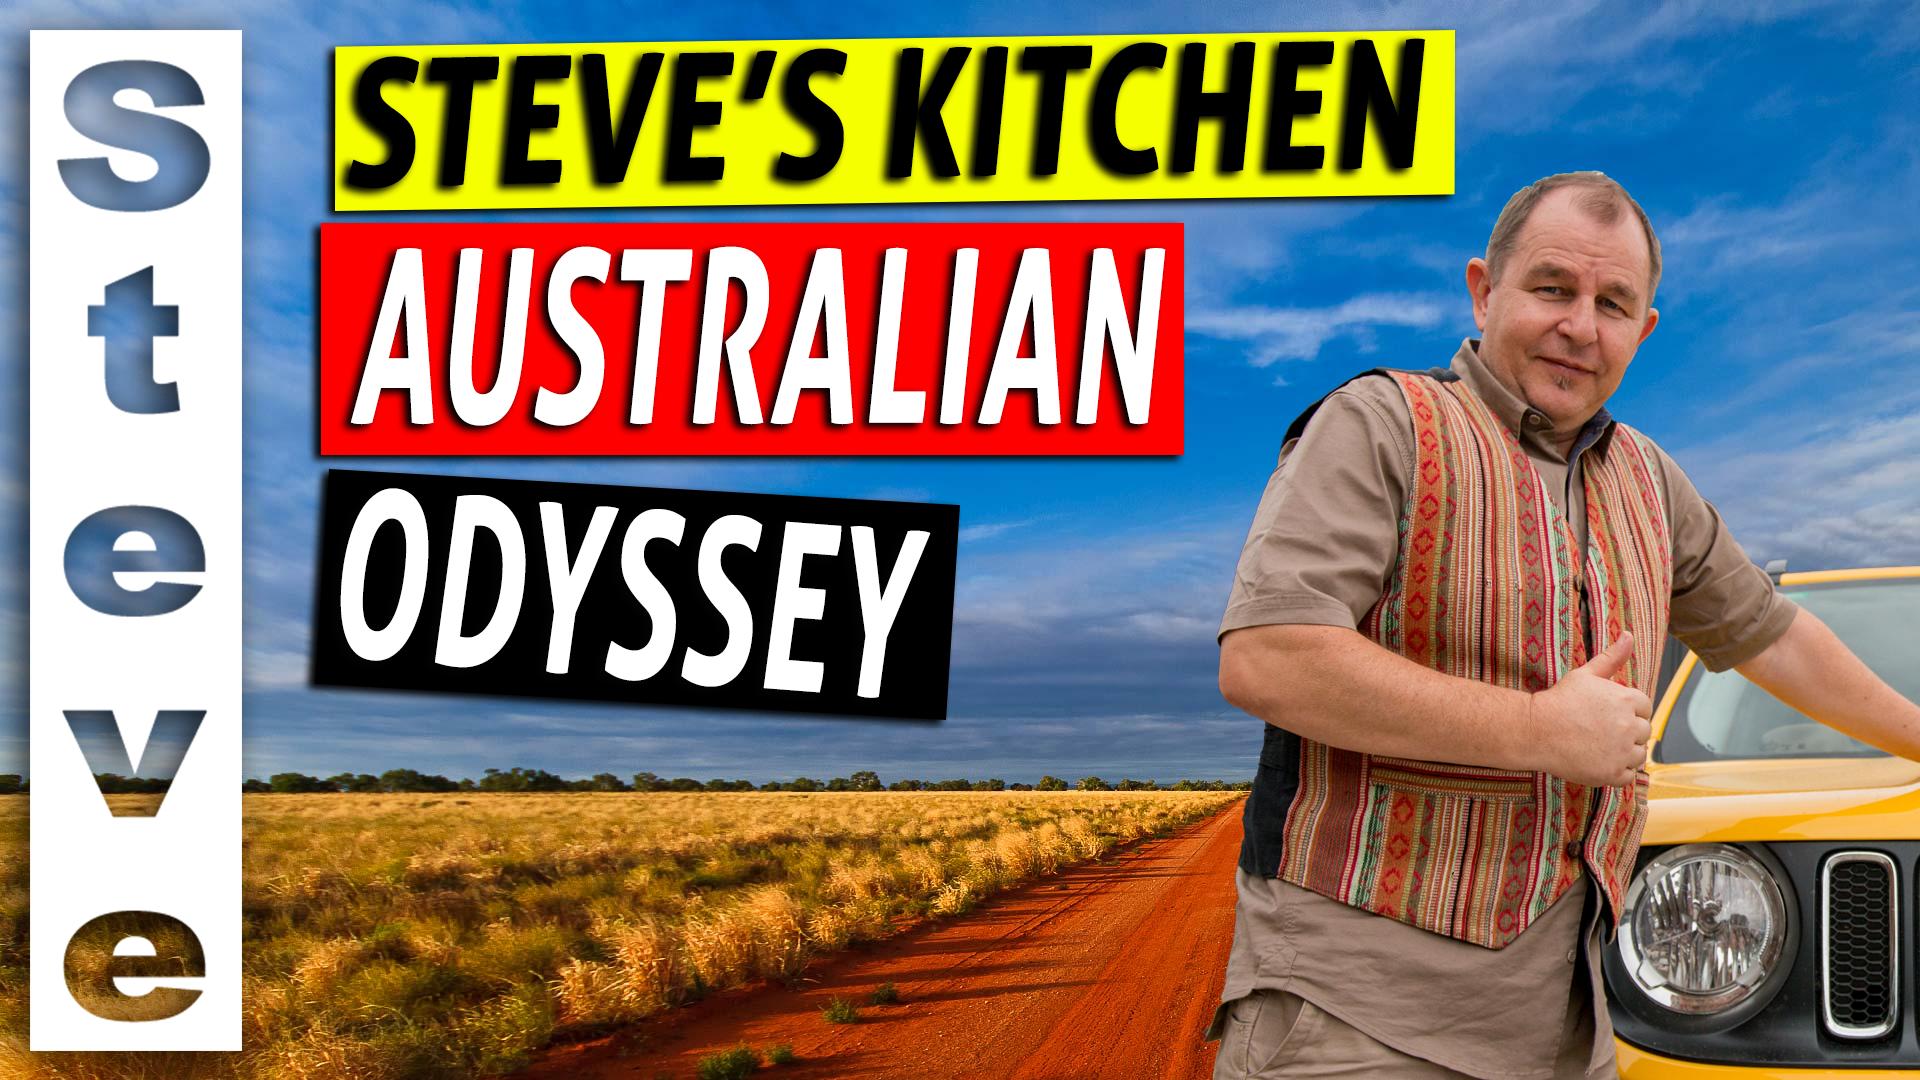 Steve's Kitchen Australian Odyssey